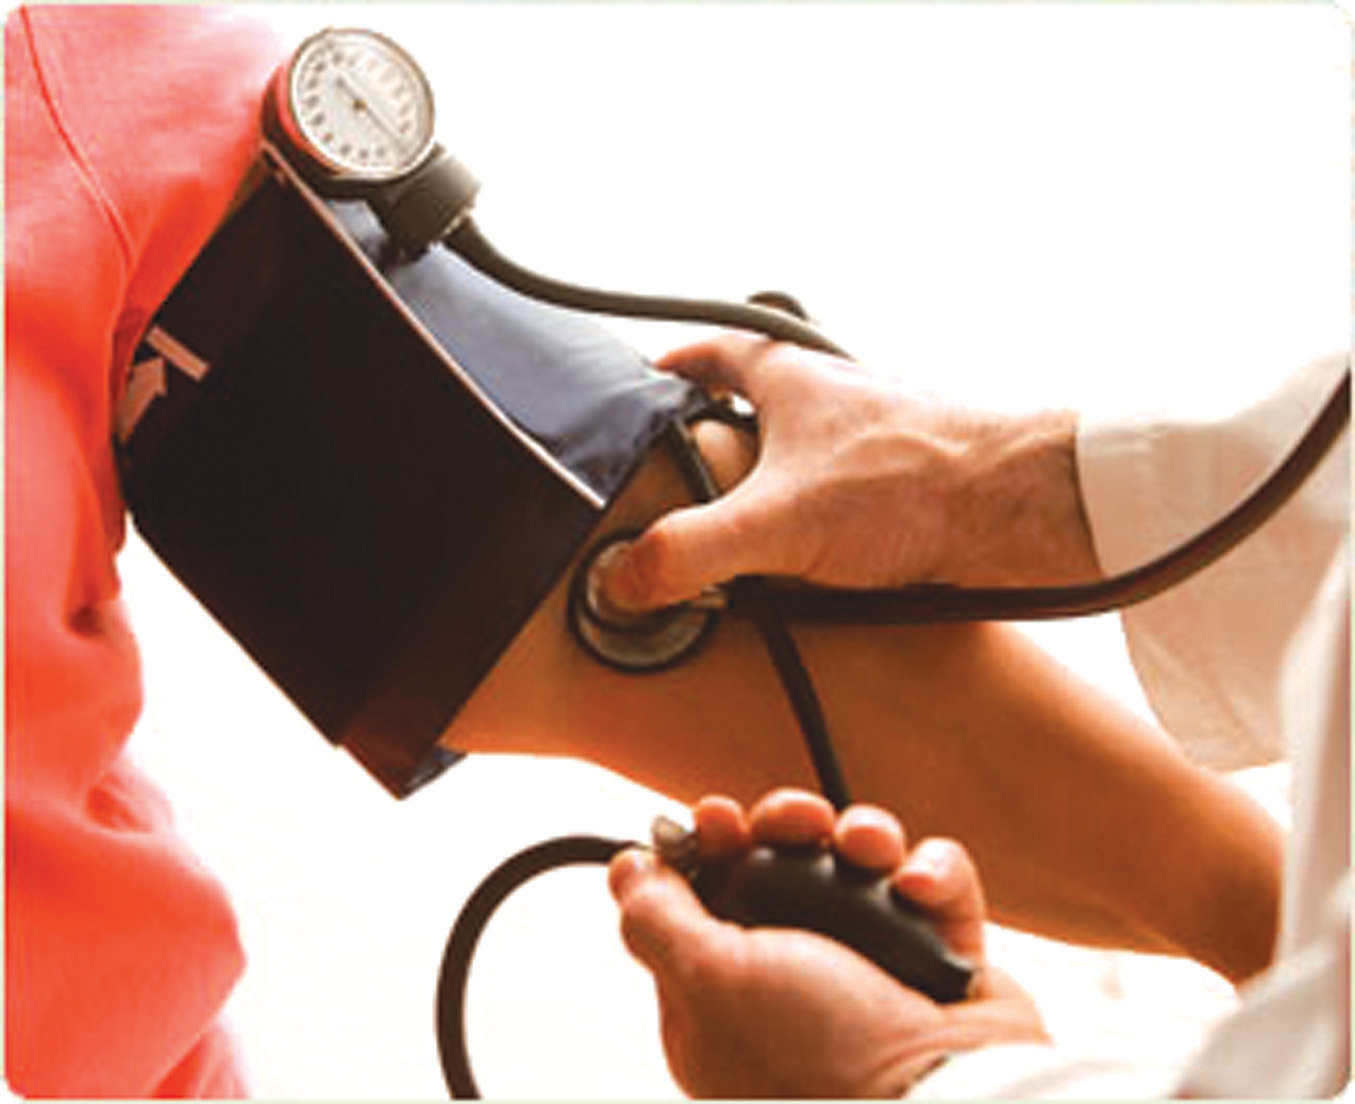 hypertension arterielle : symptomes, cause, traitement